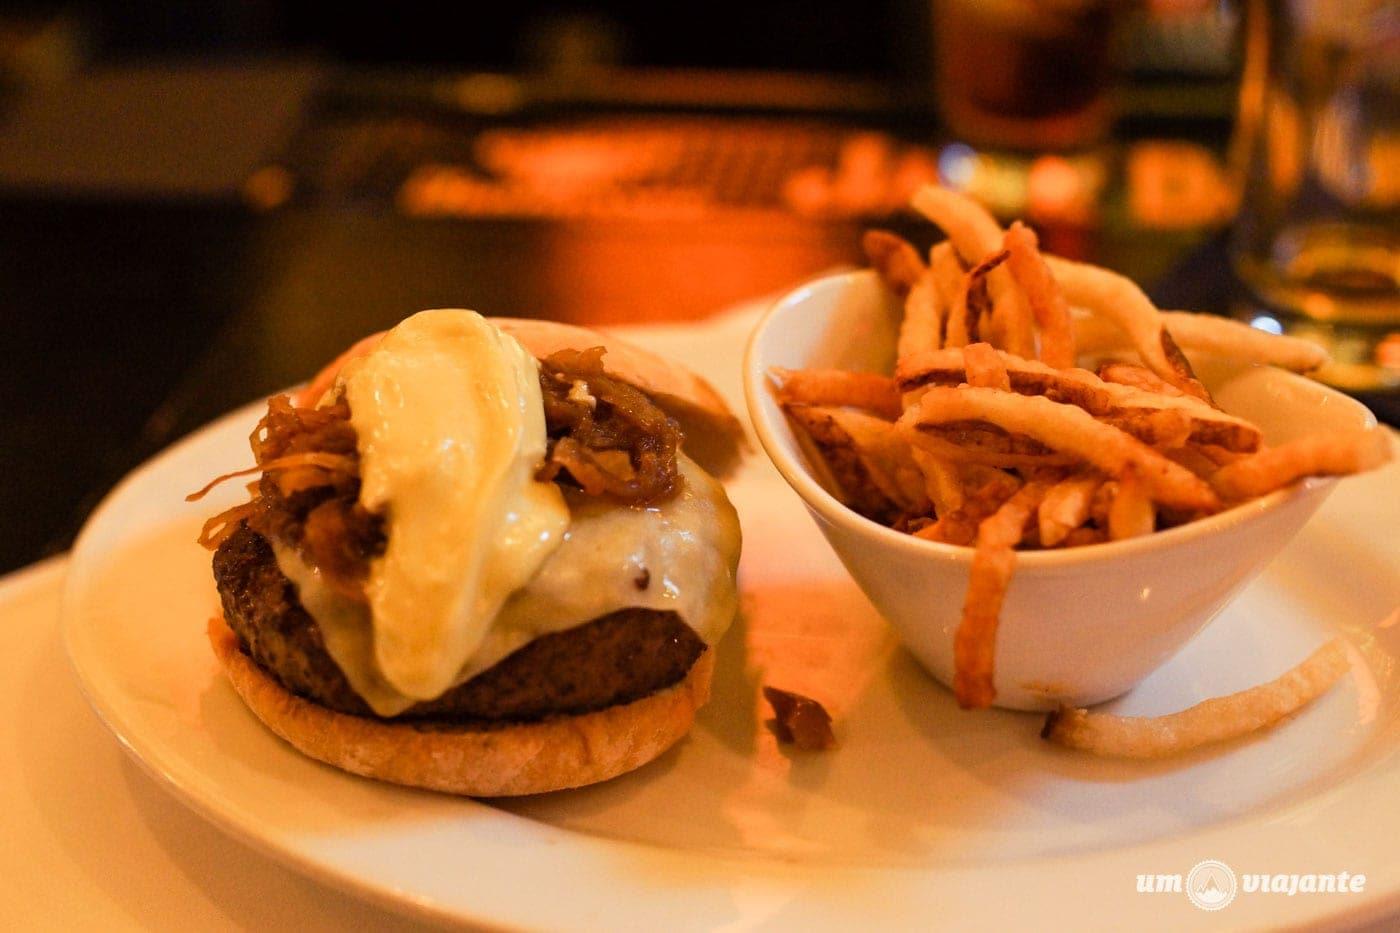 Five Napkin Burger